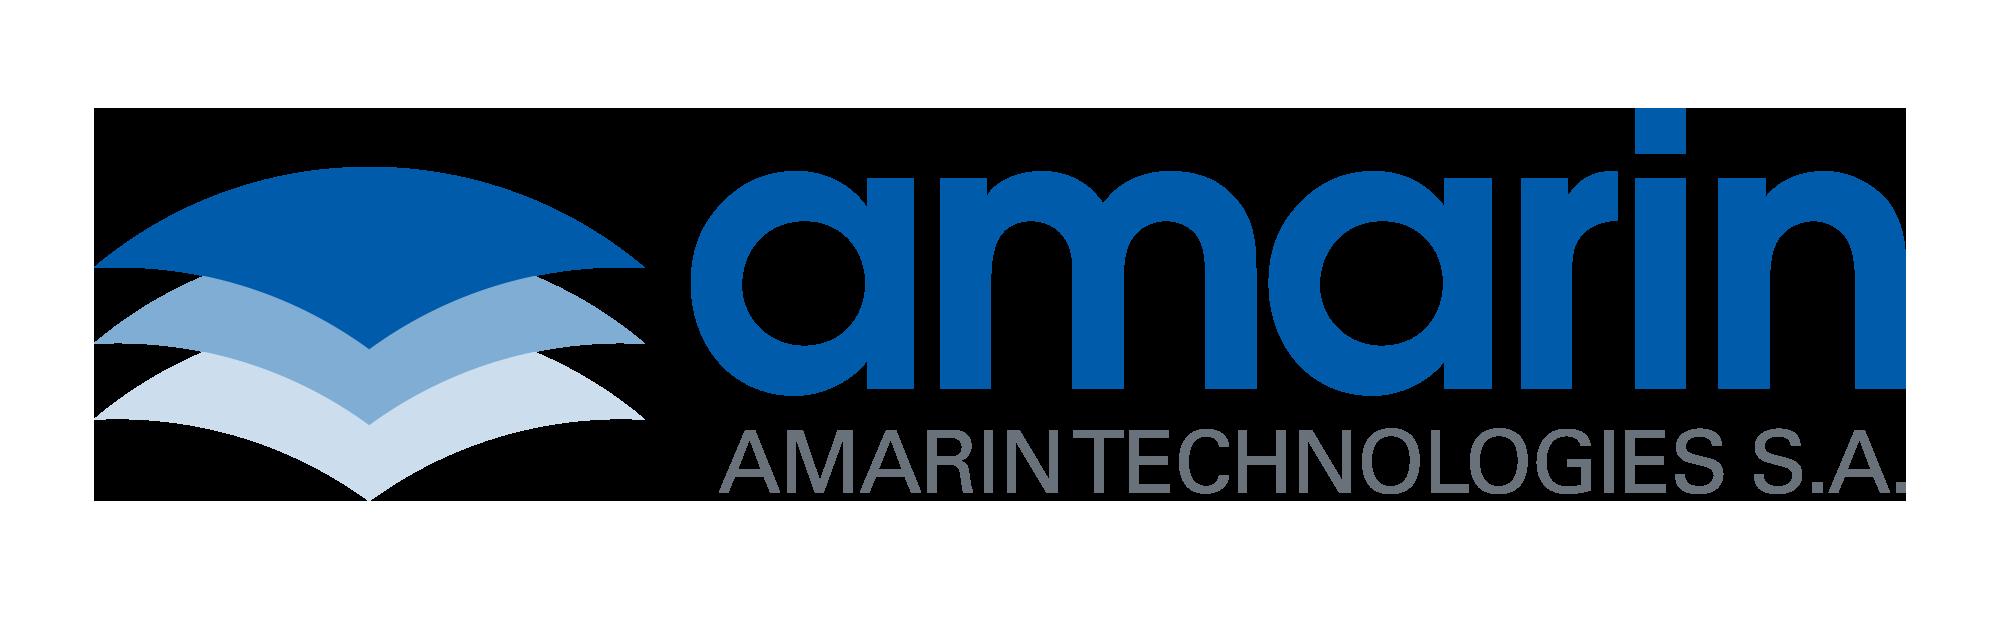 Amarin Technologies